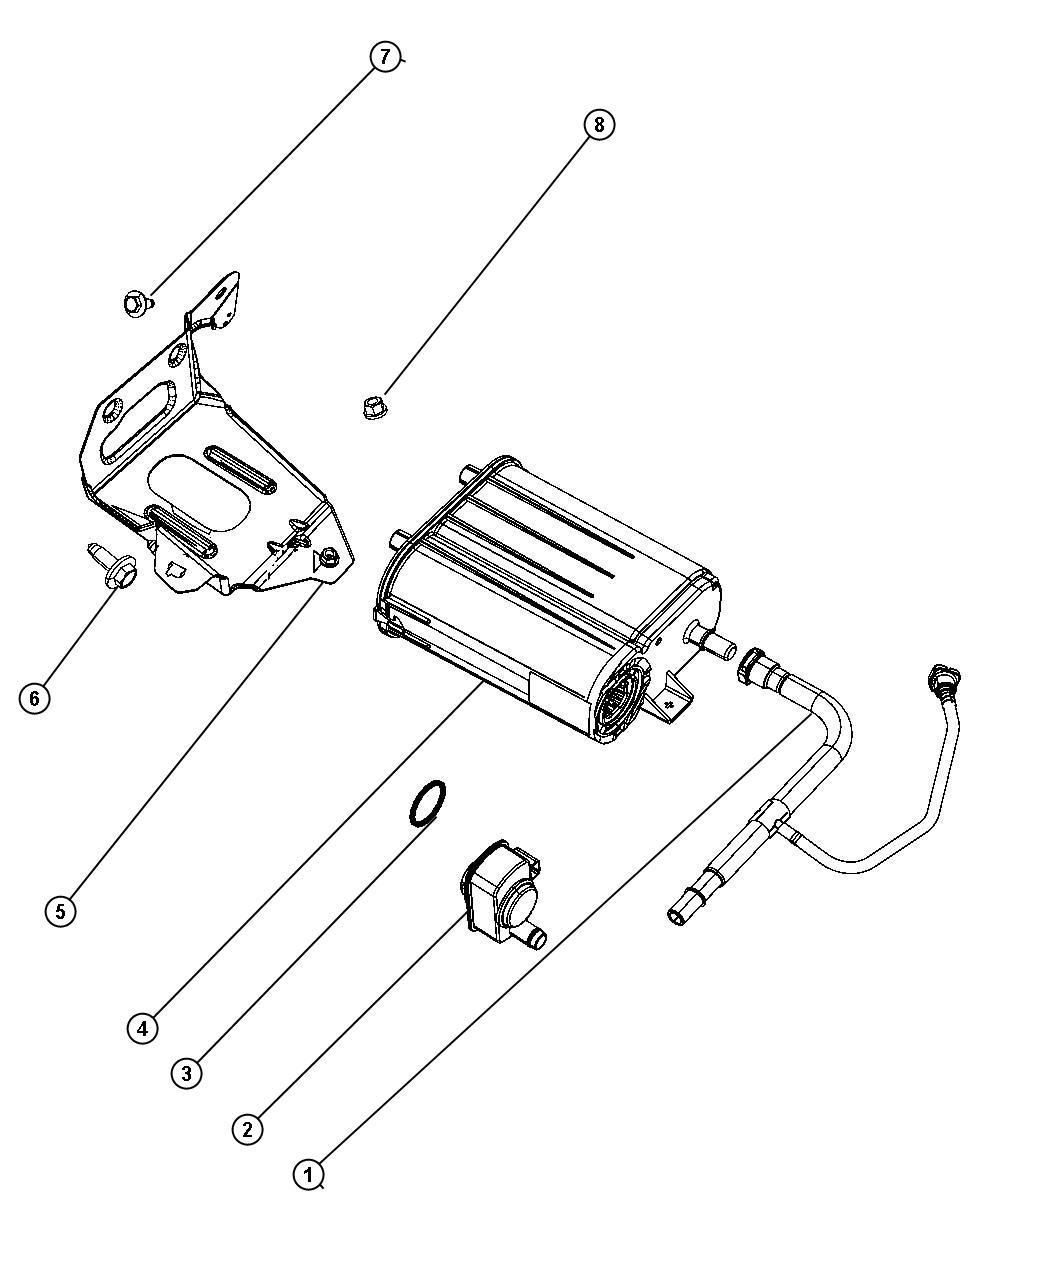 Jeep Wrangler Detector. Evaporative system integrity